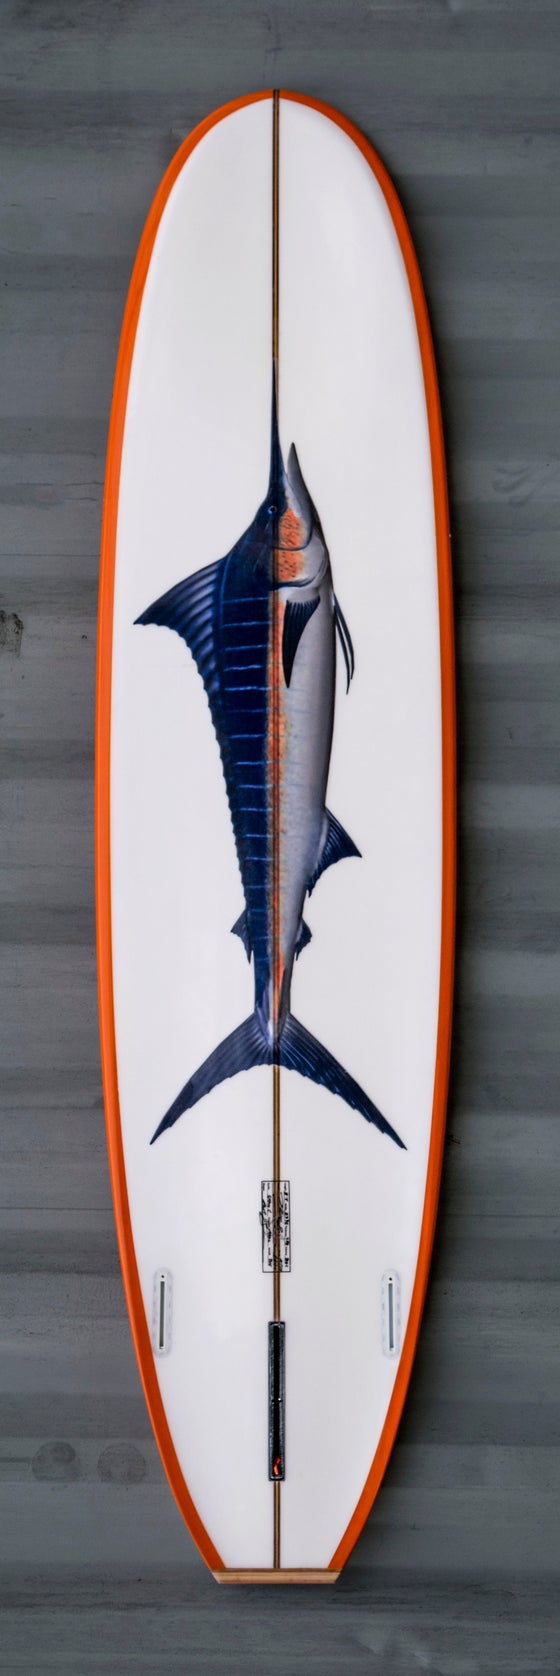 Image of 8'5 custom